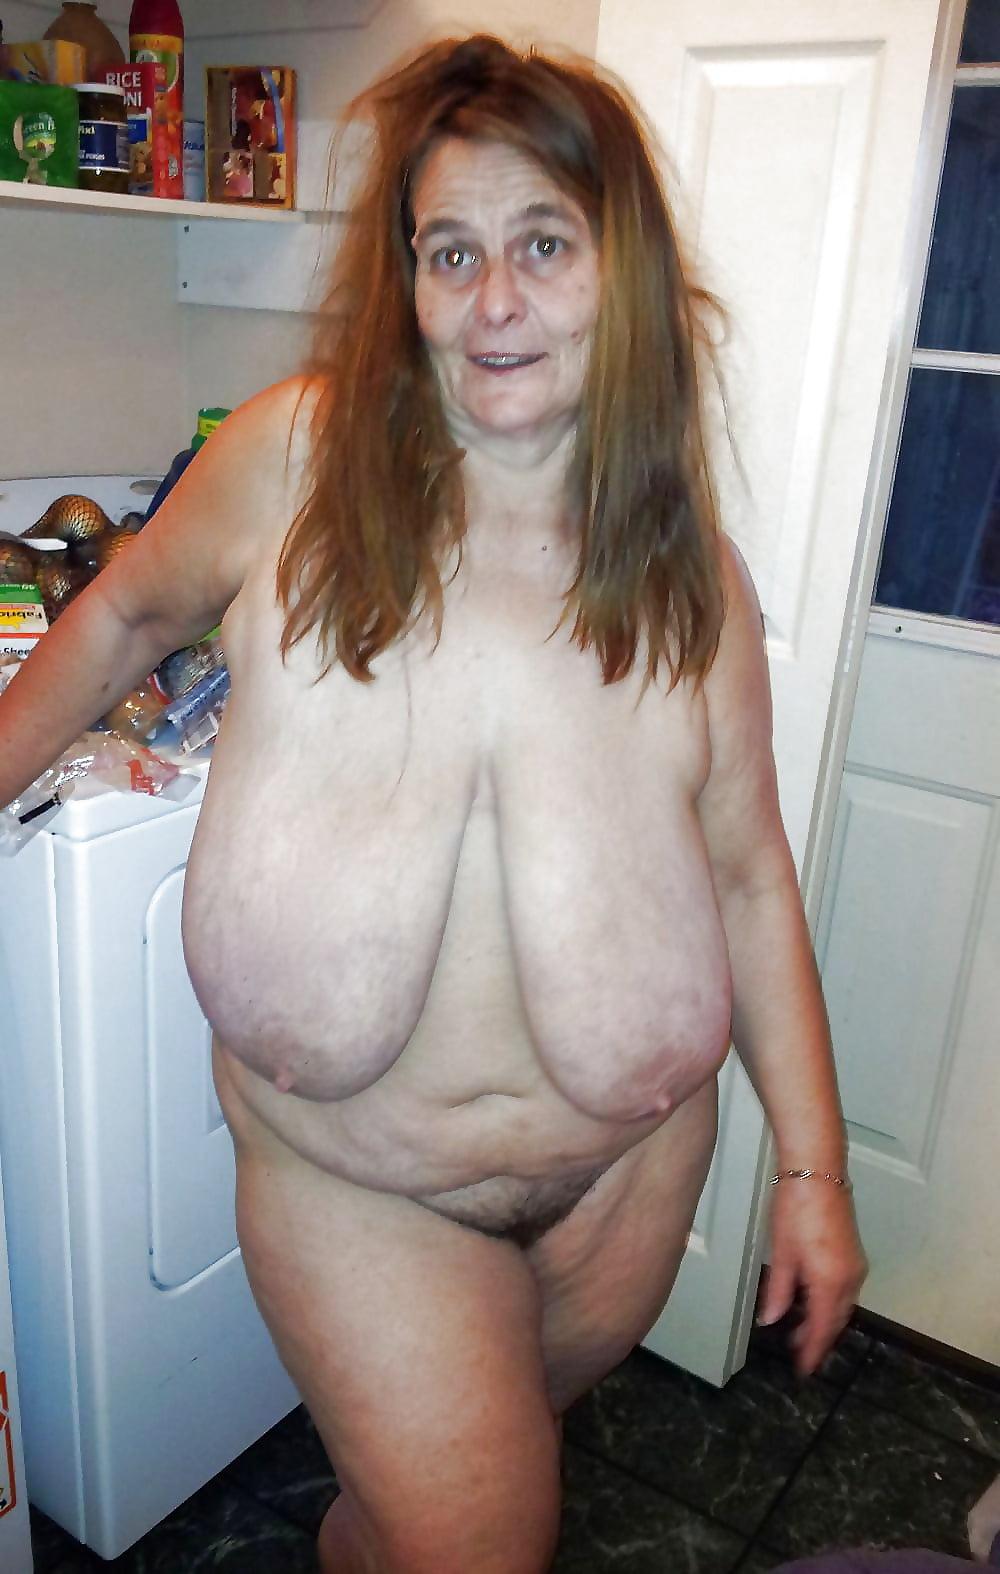 Ugly older women pics